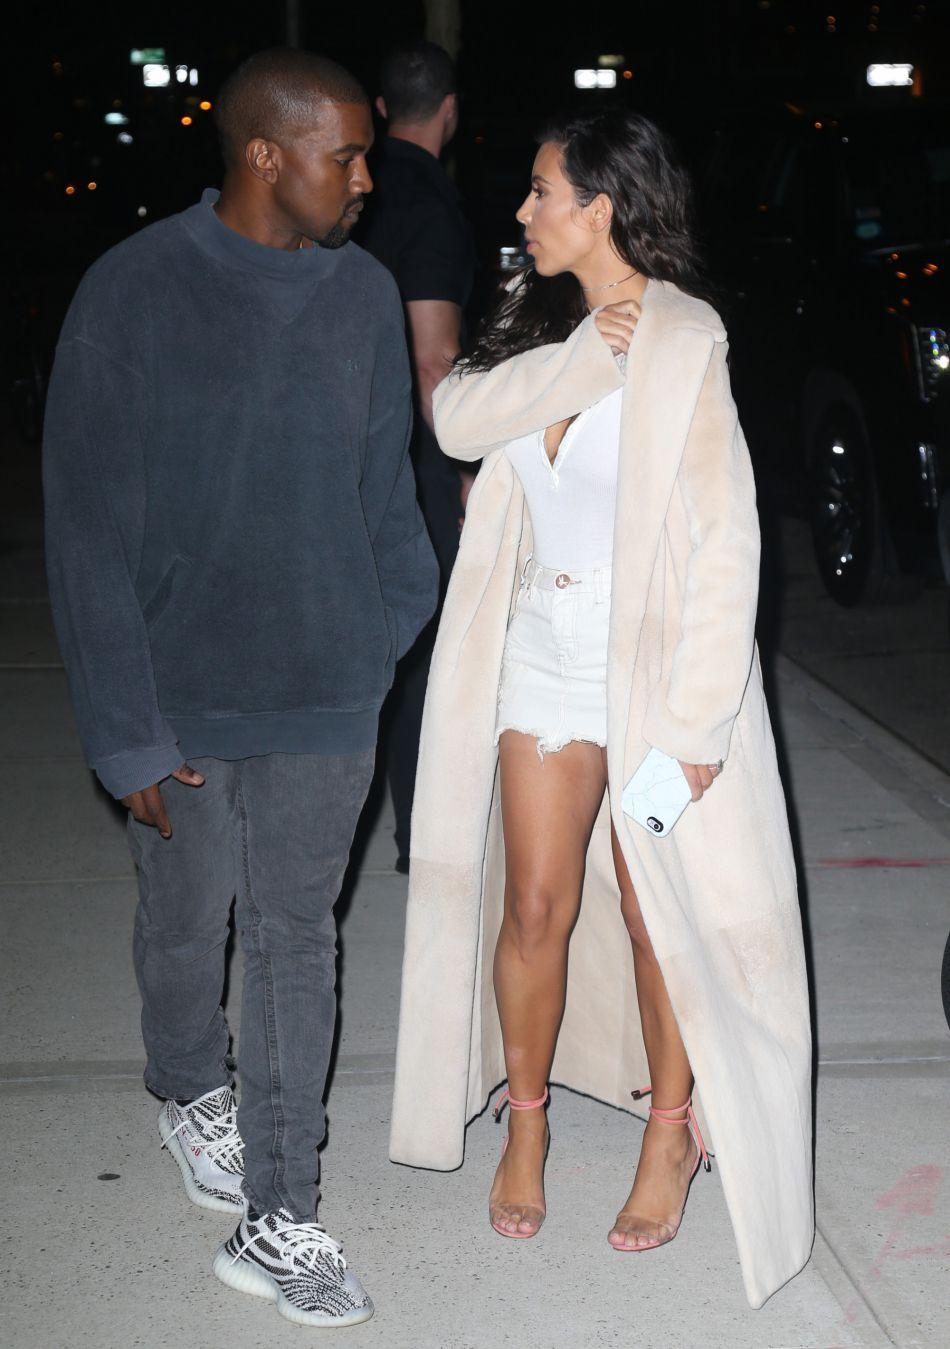 Kim Kardashian et Kanye West sortent en amoureux le 29 août 2016.